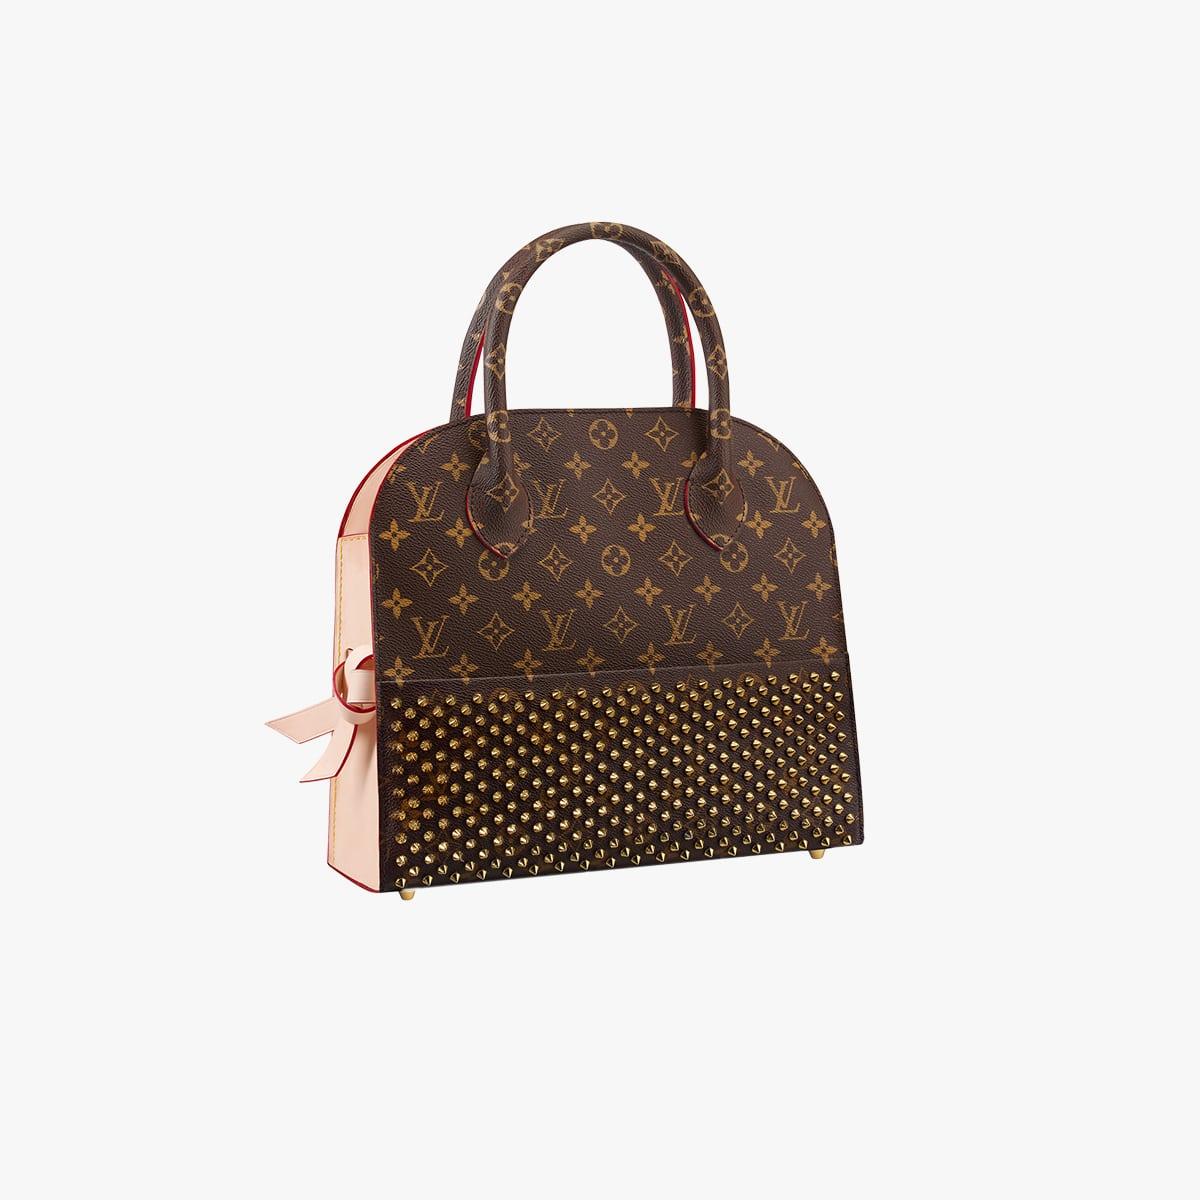 christian louboutin purses on sale